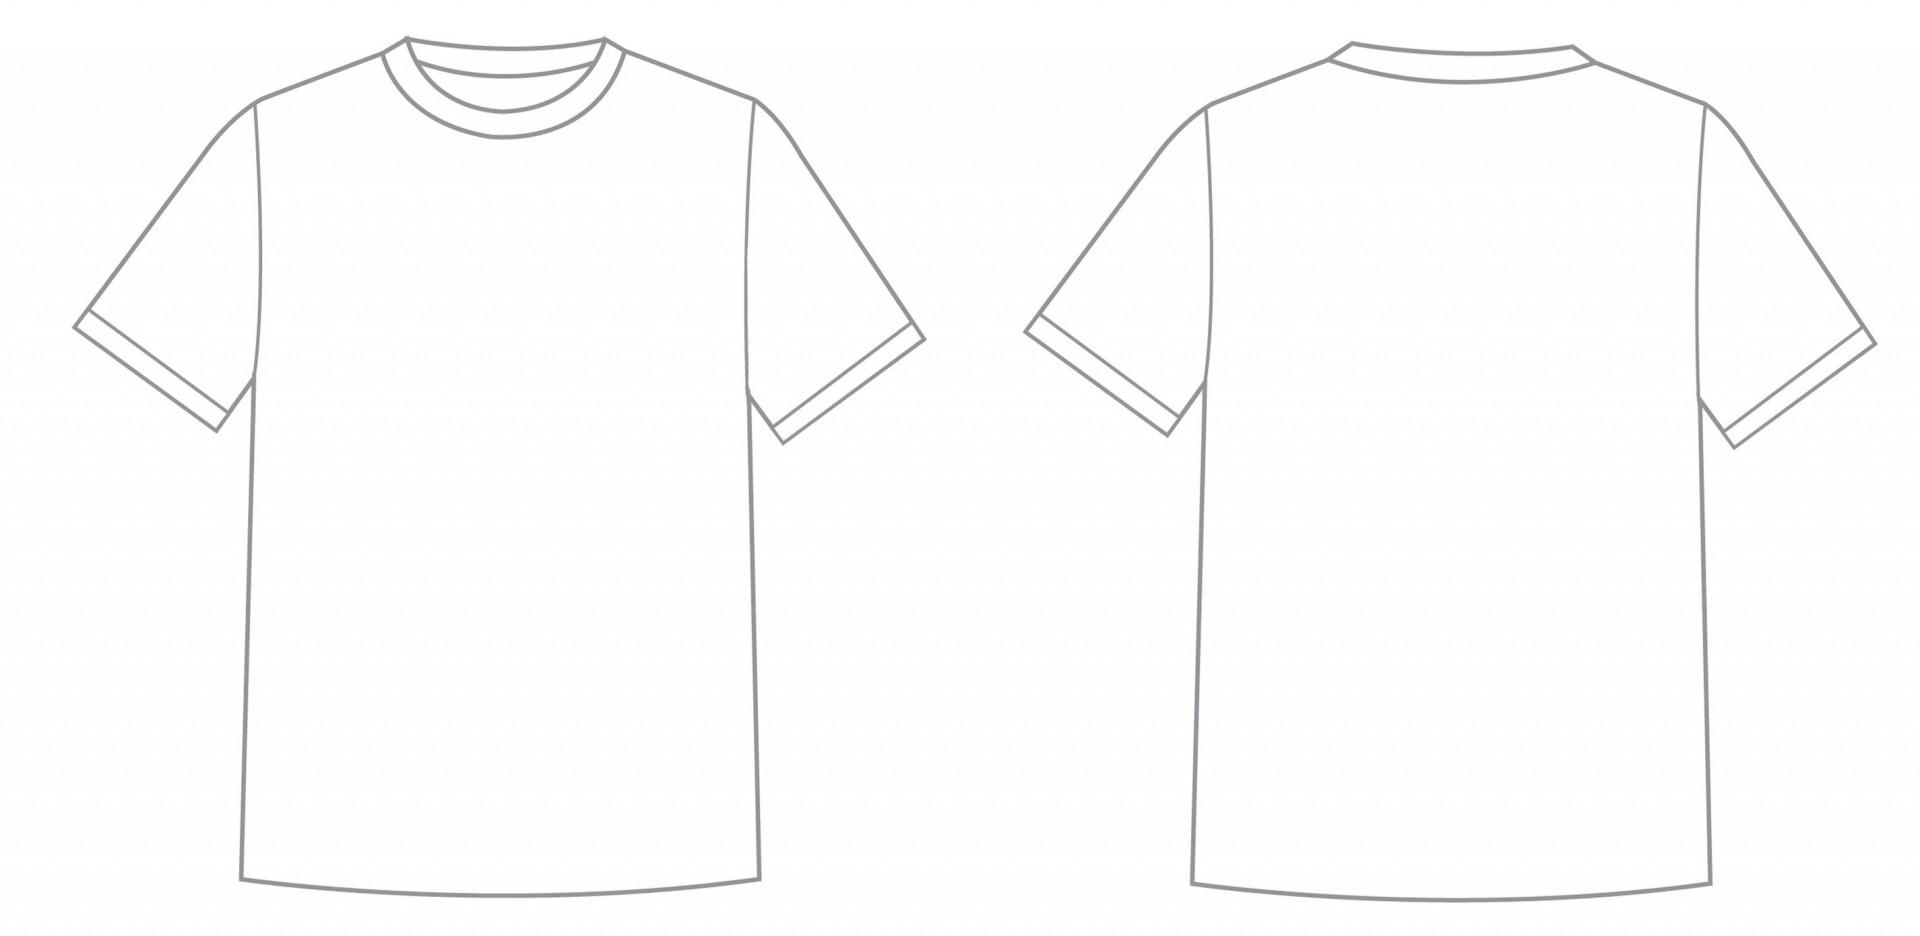 003 Impressive T Shirt Template Design Photo  Psd Free Download Editable1920